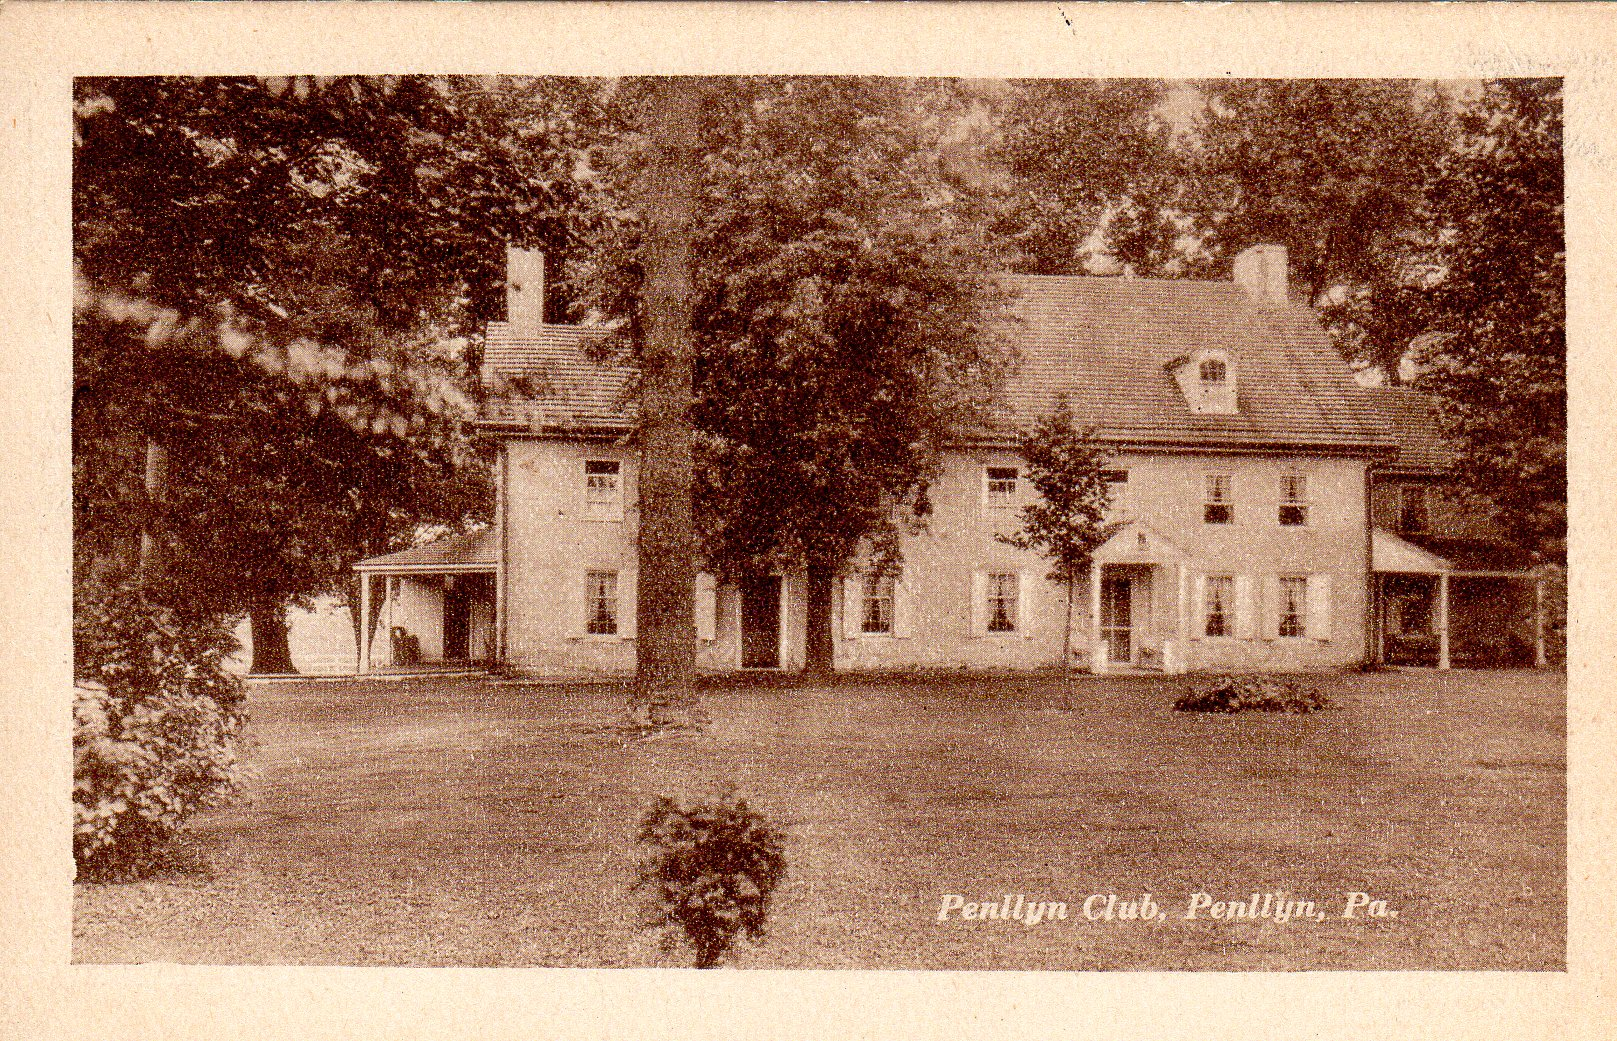 Post Card Collection (E Simon)_2682_69_Penllyn Club, Penllyn, Pa